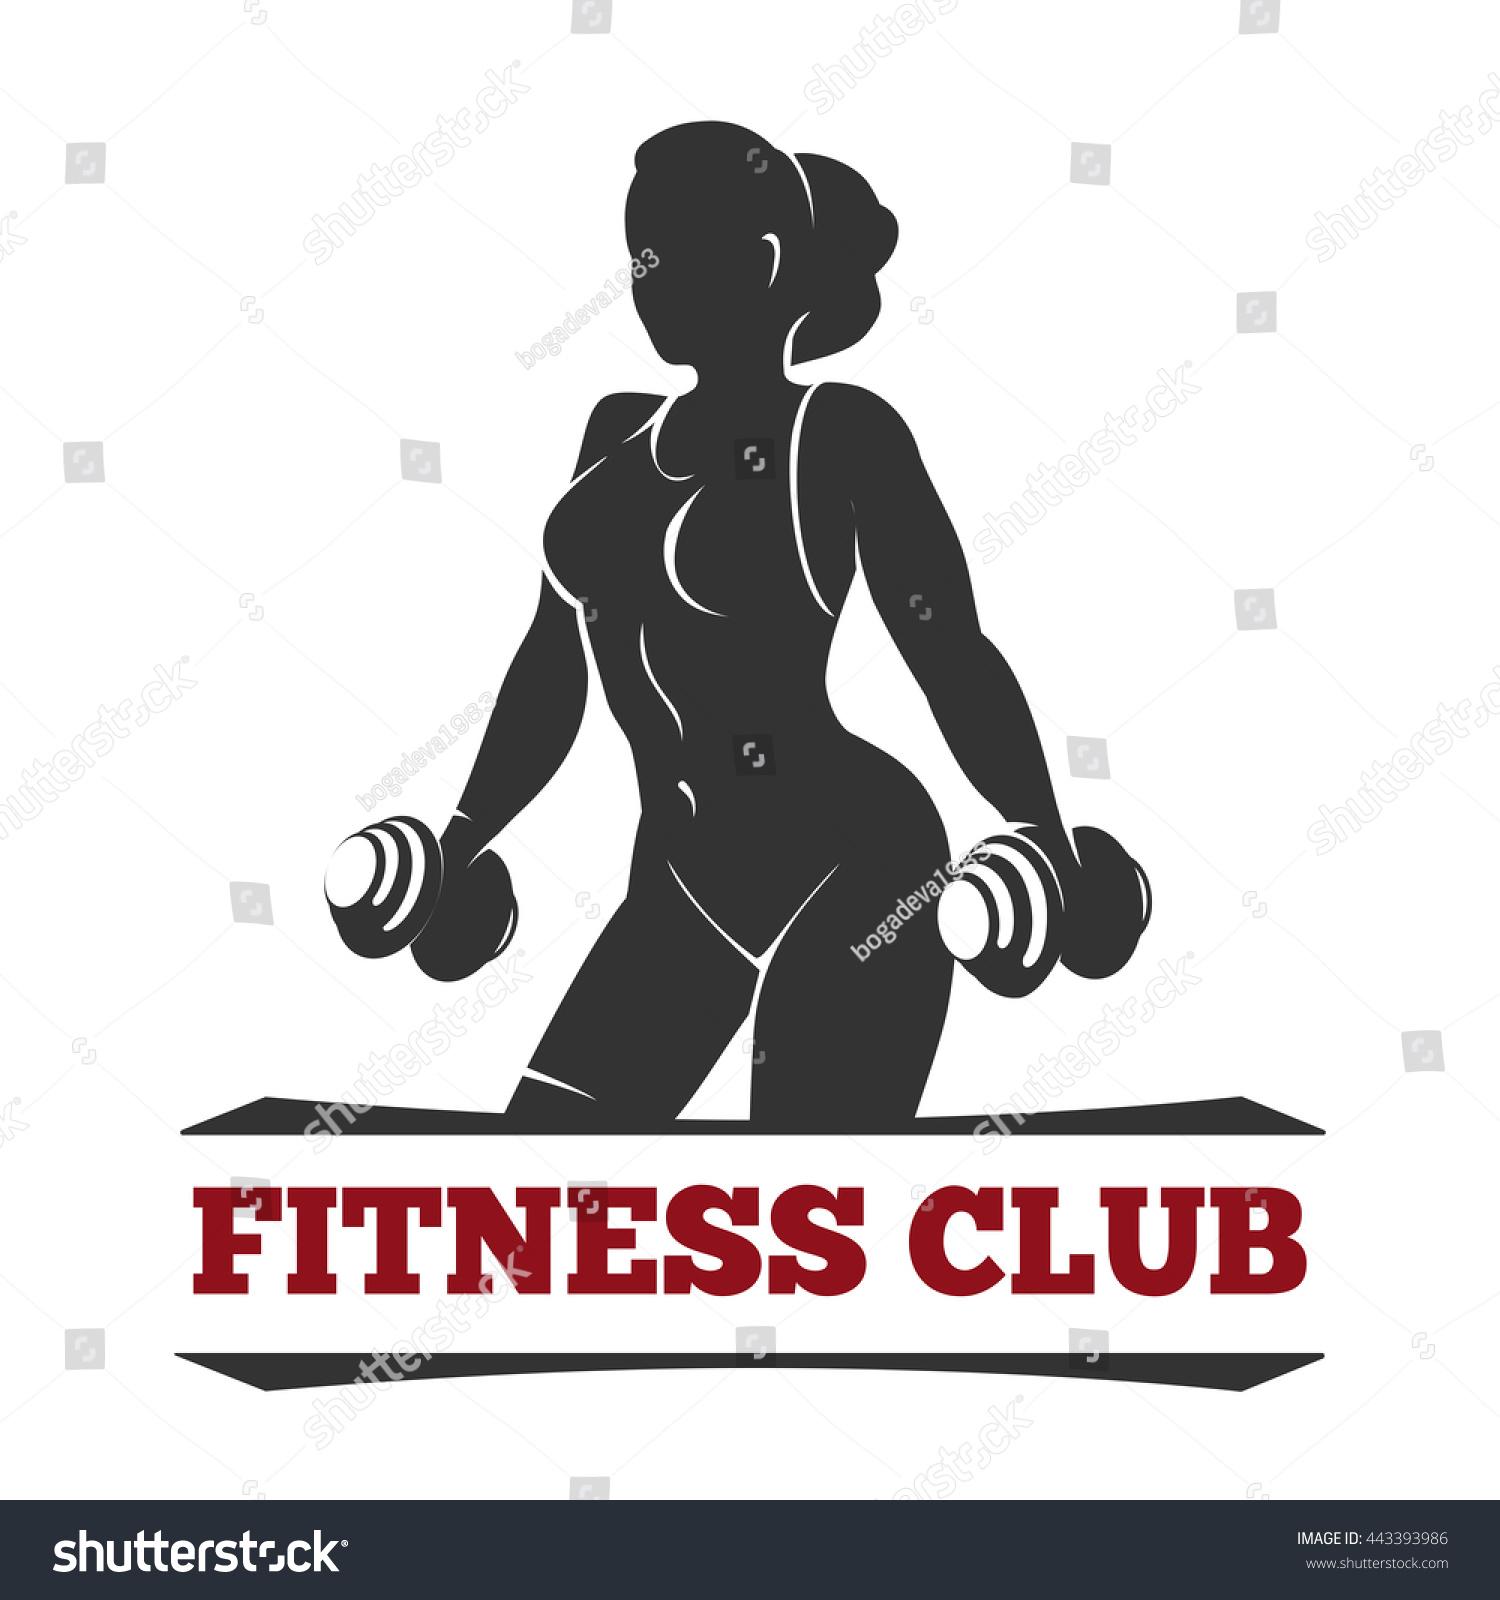 Fitness club gym emblem poster design stock vector for Gimnasio fitness club